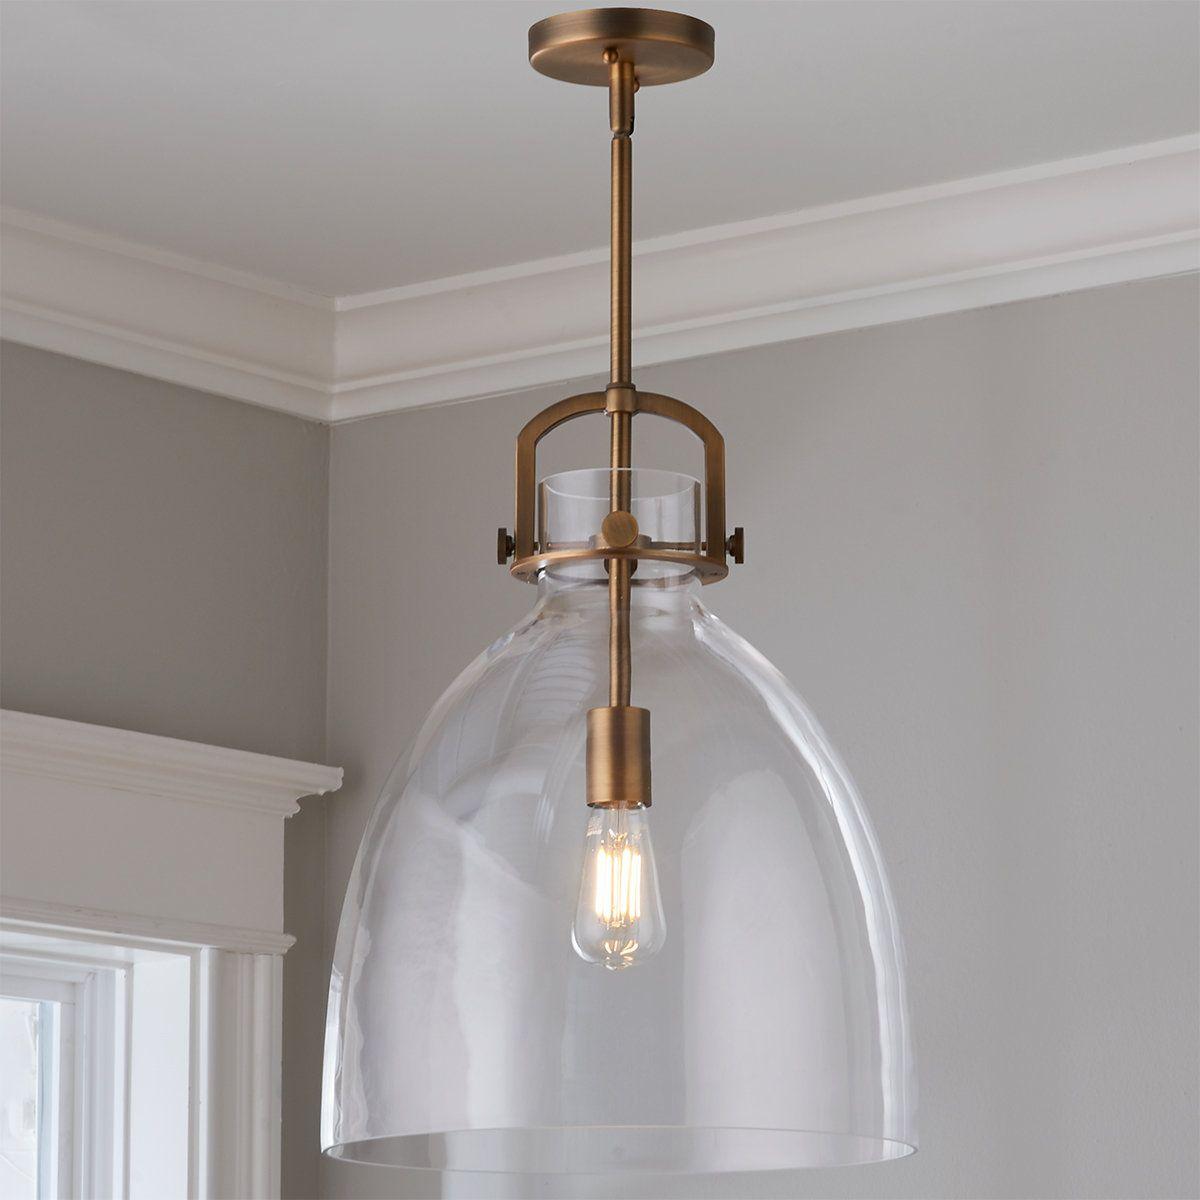 Urban Dome Pendant Medium Dome Pendant Glass Pendent Lights Vintage Bulb